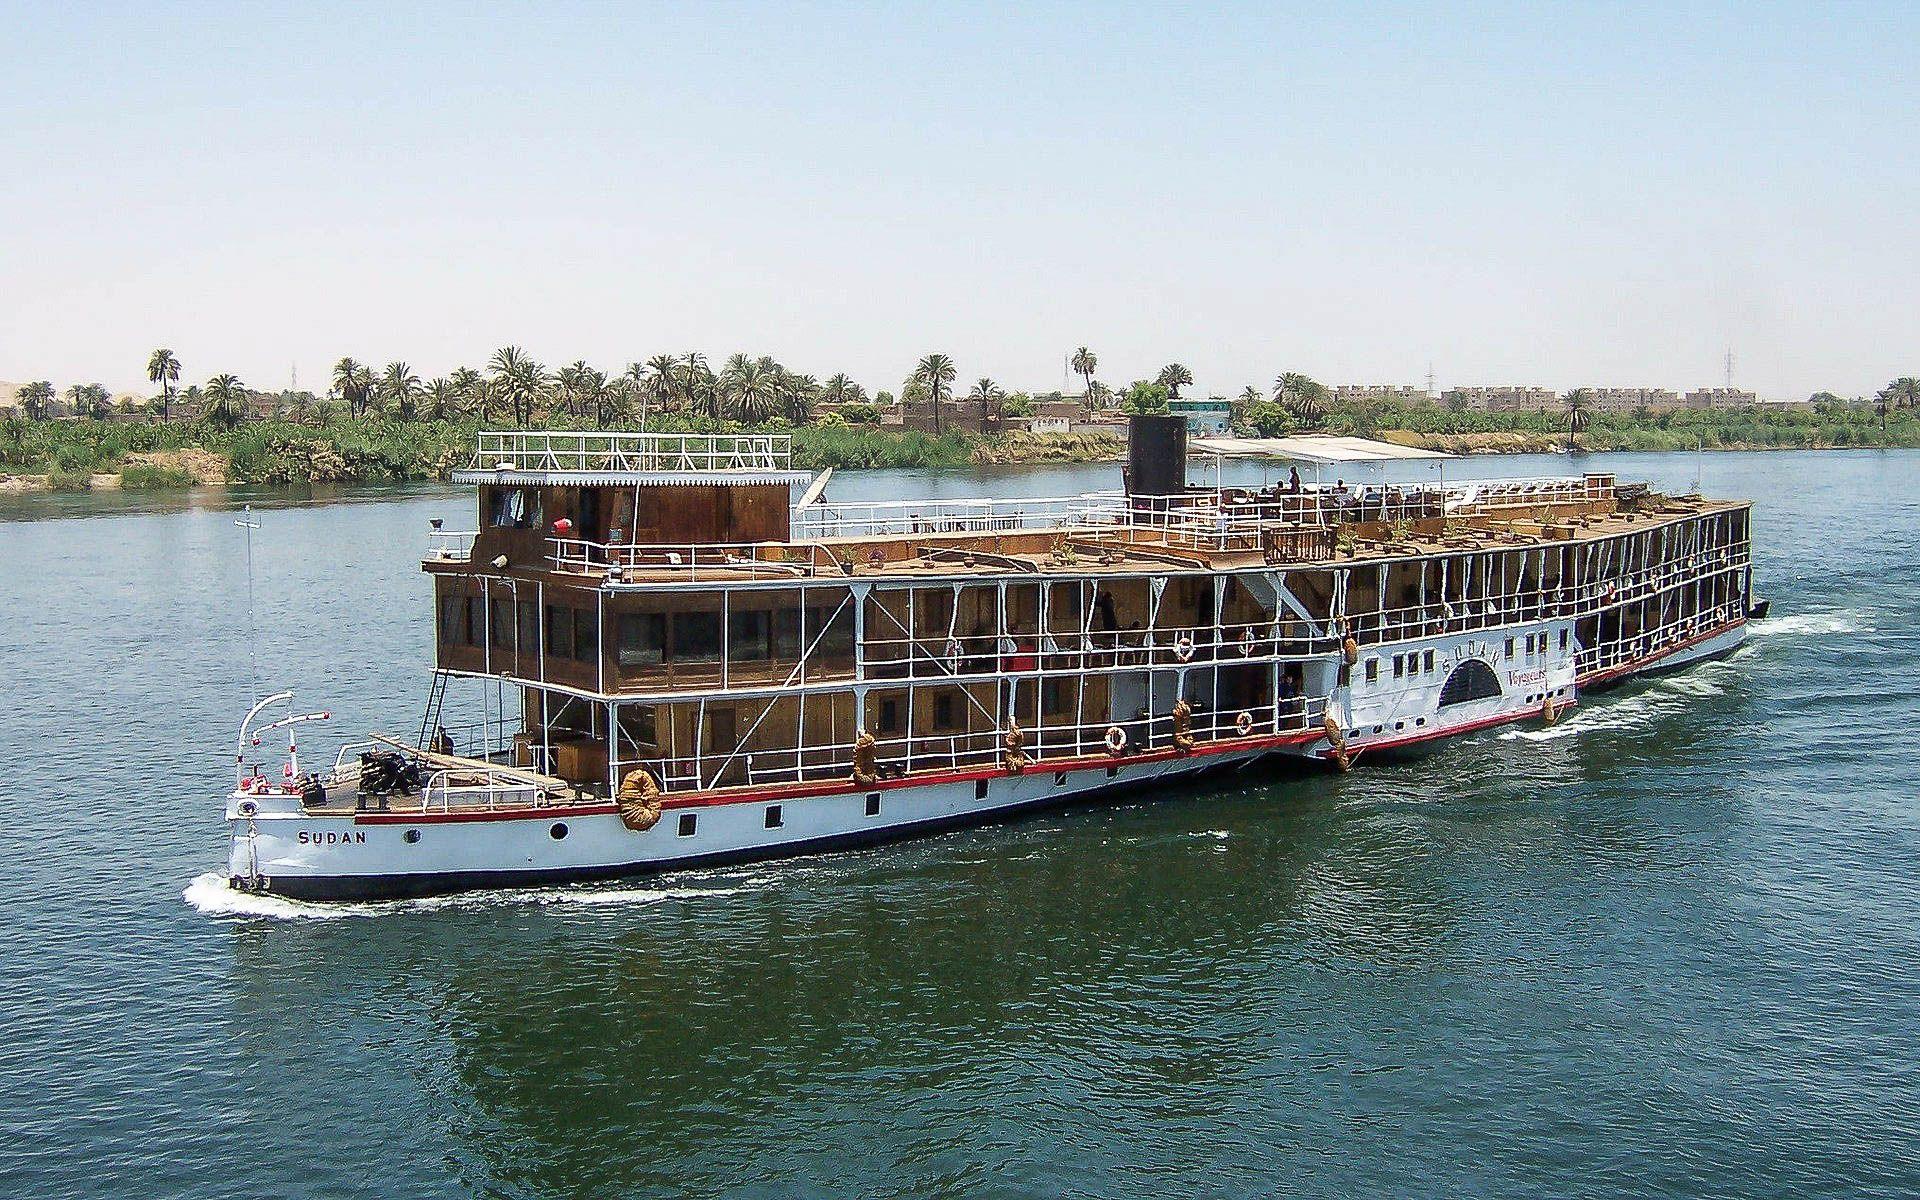 LesVoyageuses-organiser-voyage-egypte-conseils-25